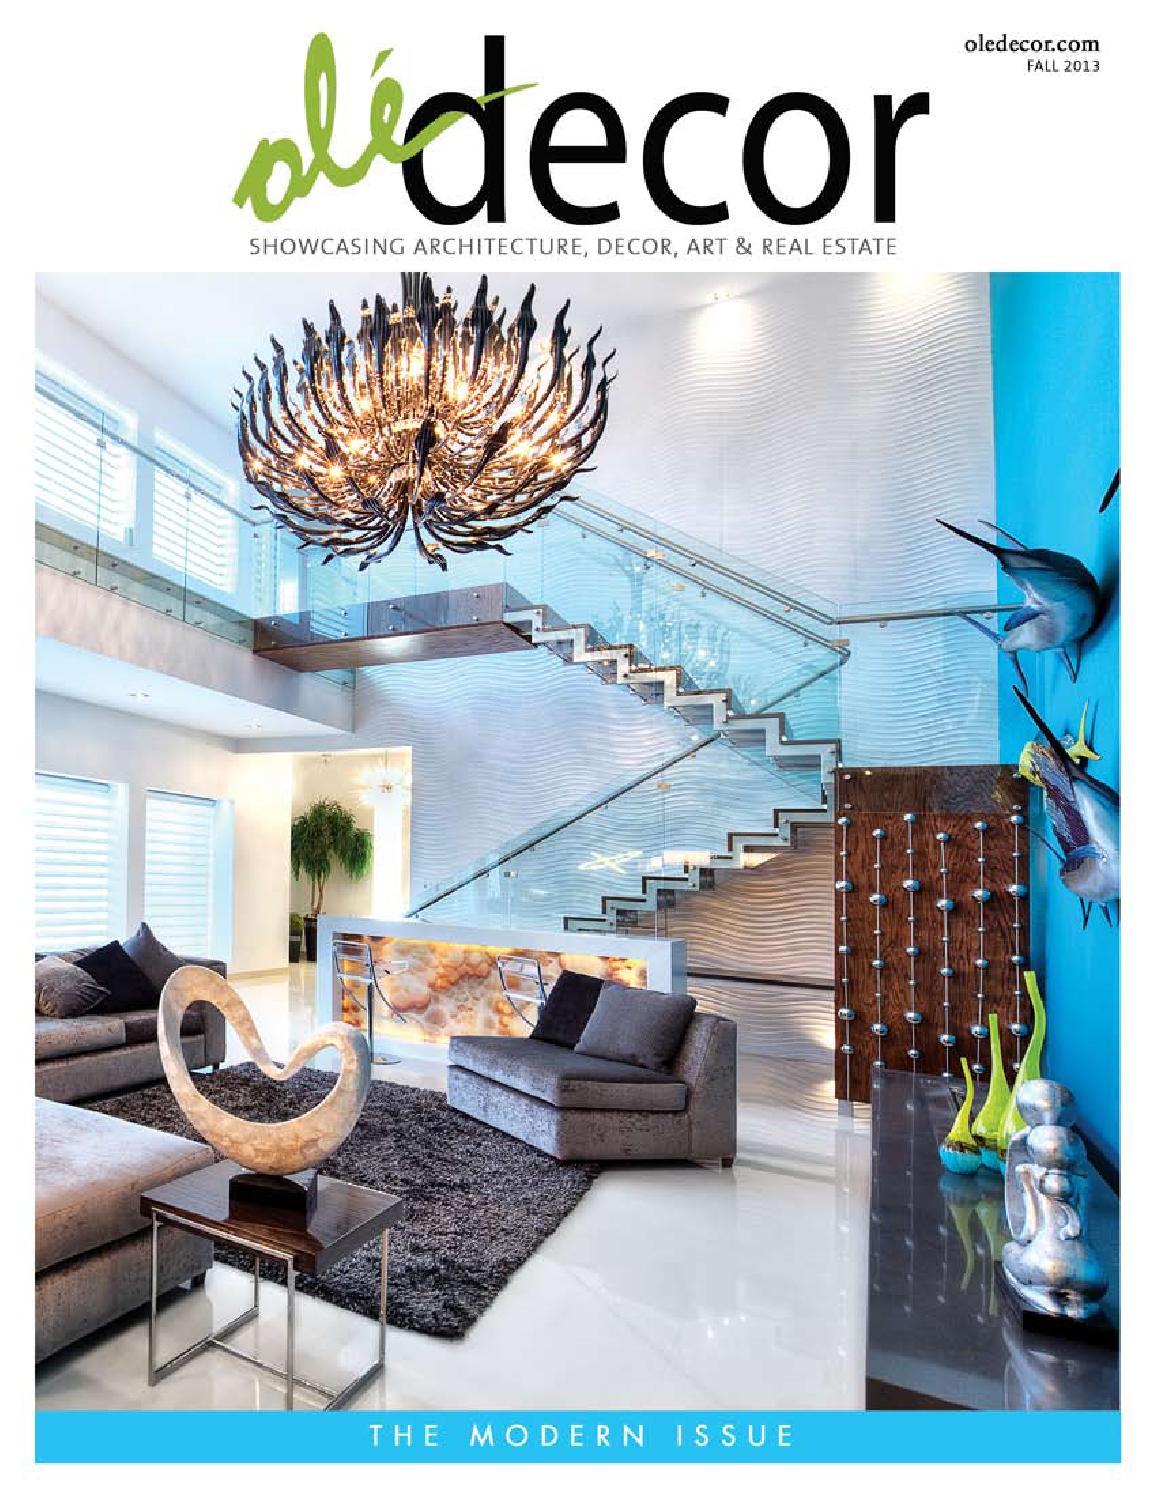 100 home decor magazines nashba com tiny bedroom ideas men 2017 bedroom ide 100 home Home interior magazines online